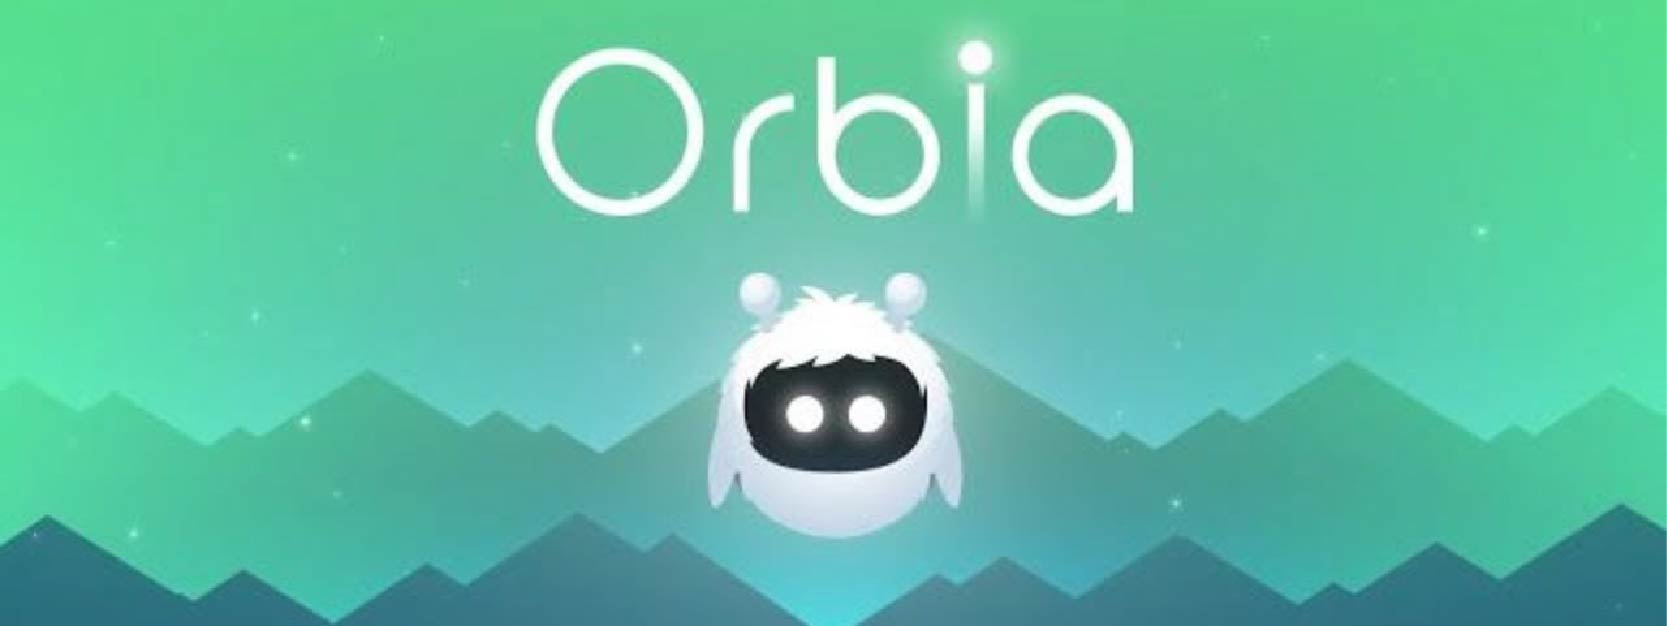 orbia thin-01